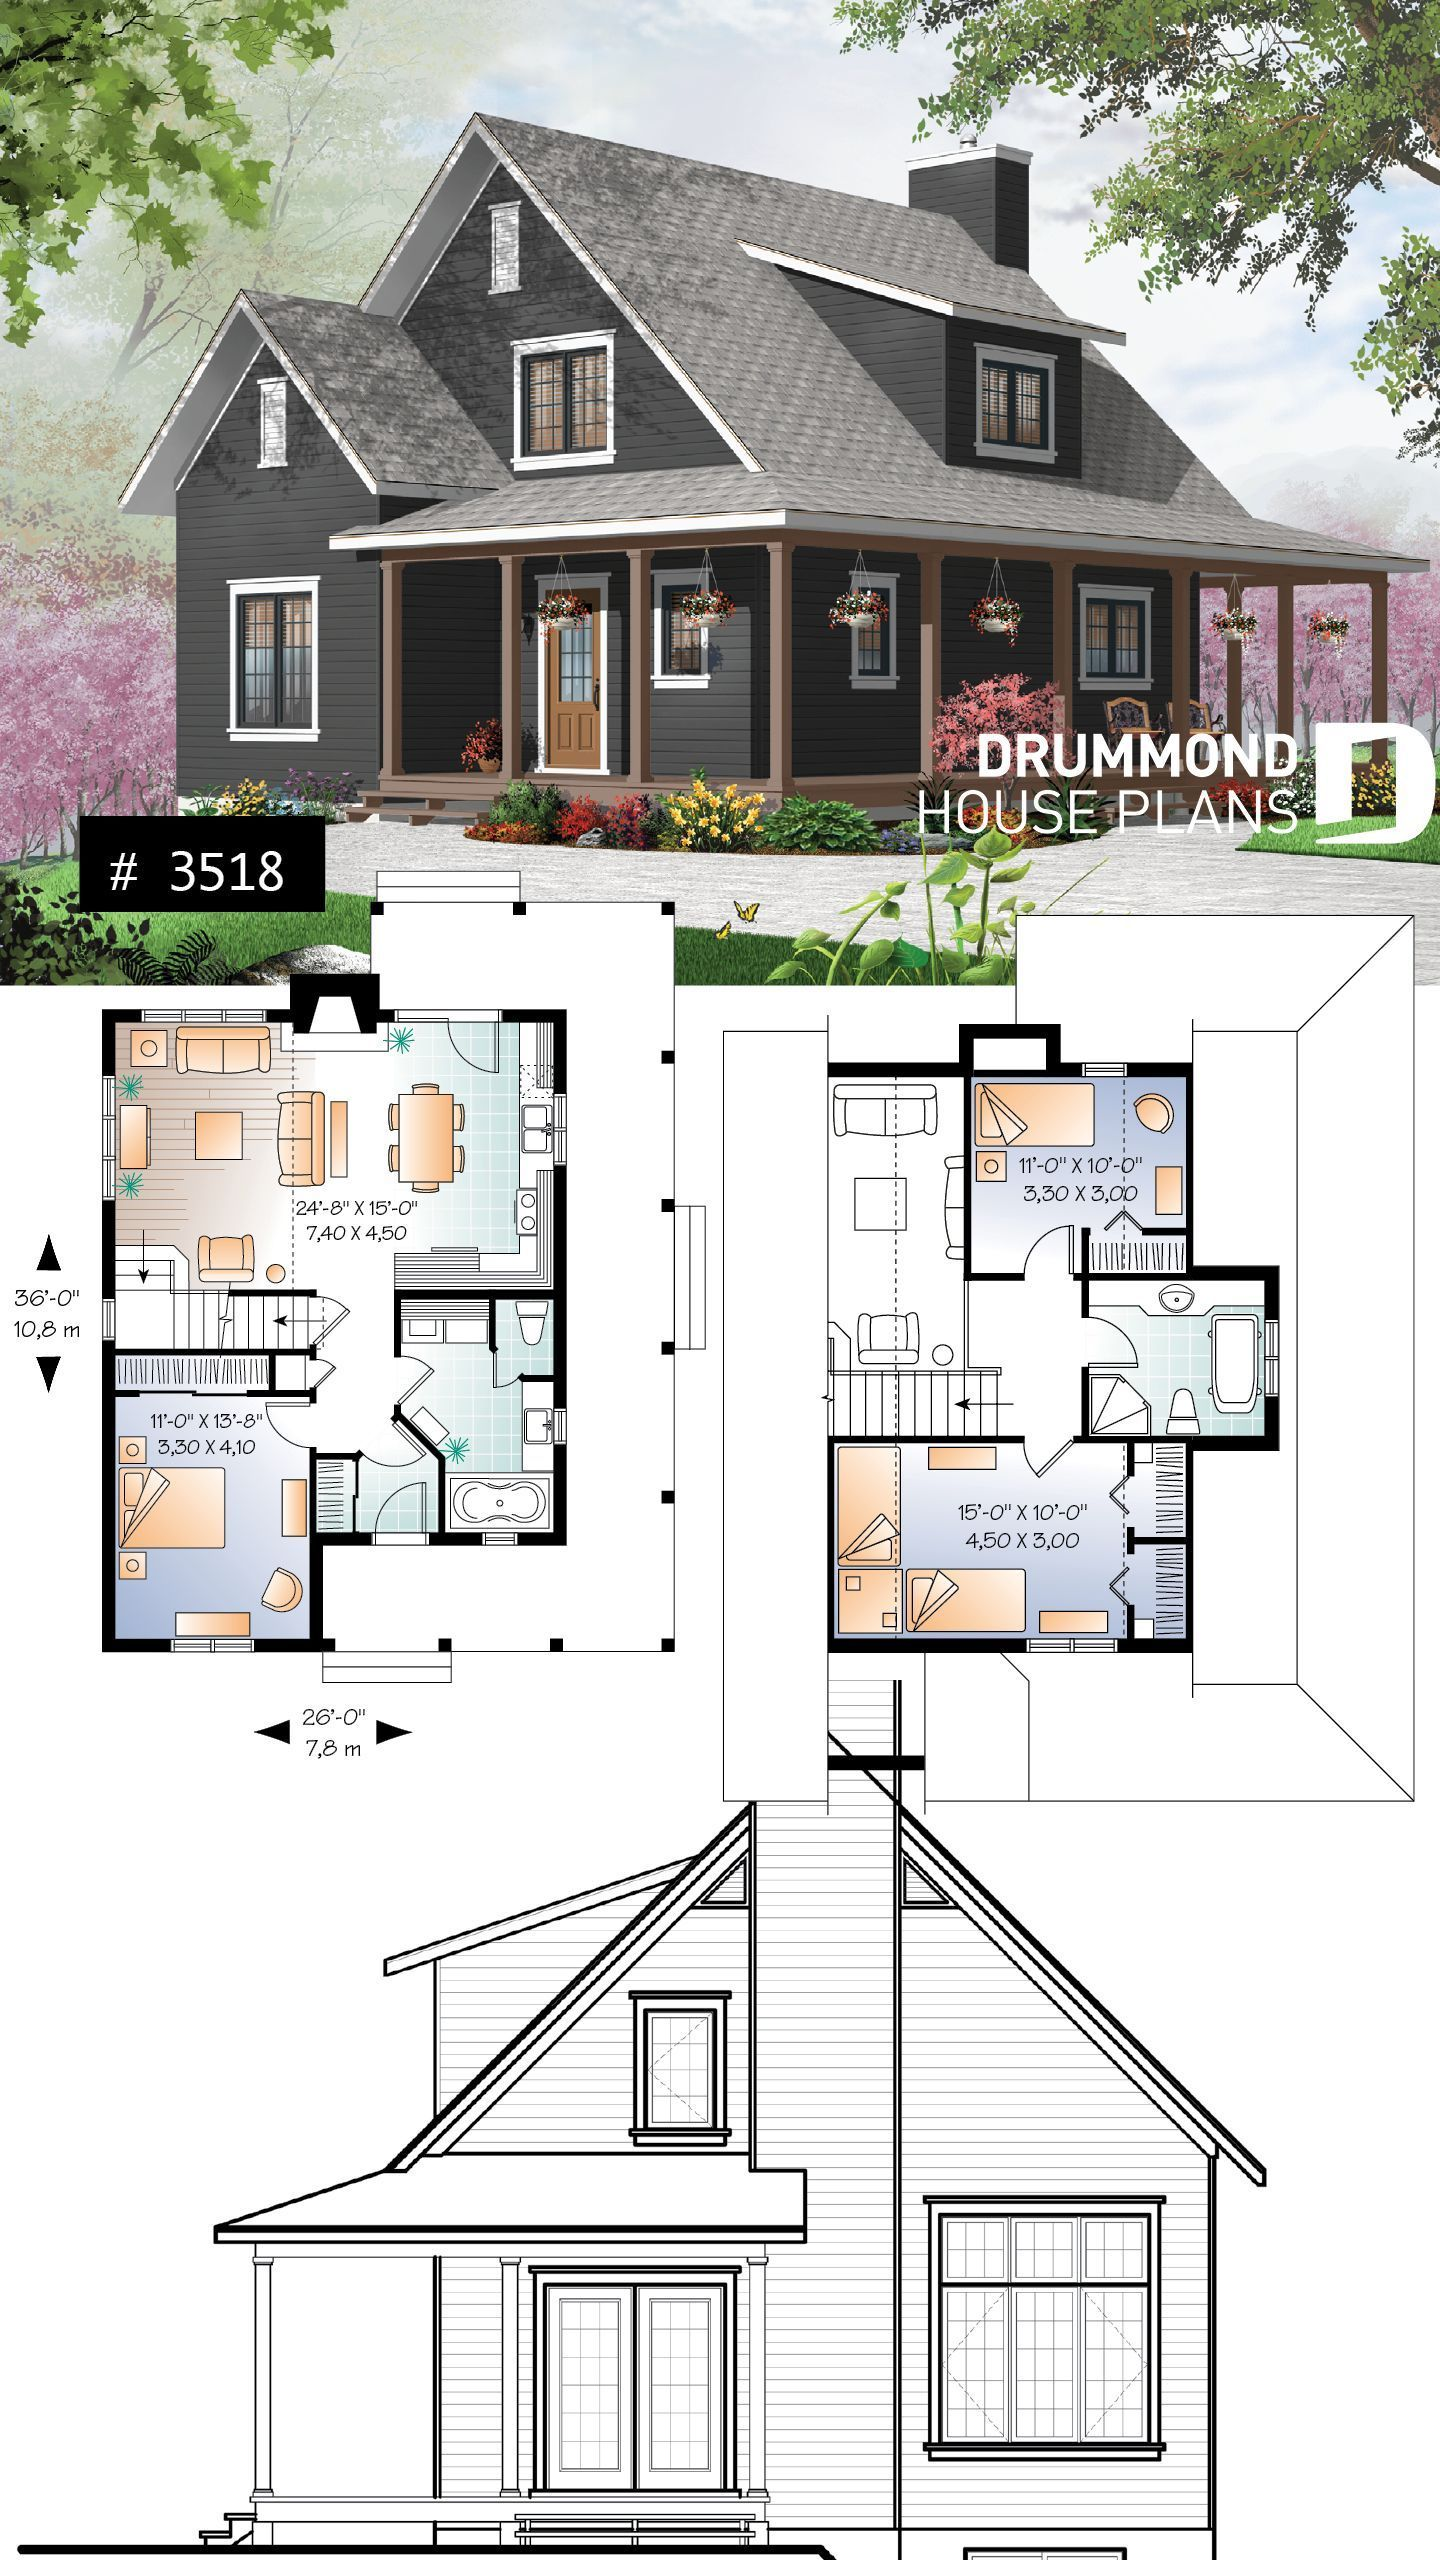 Floor Plan Beautiful Farmhouse Cottage House Plan With Wrapar Floor Plan Beautiful Farmhouse C In 2020 Farmhouse Plans House Plans Farmhouse Farmhouse Exterior